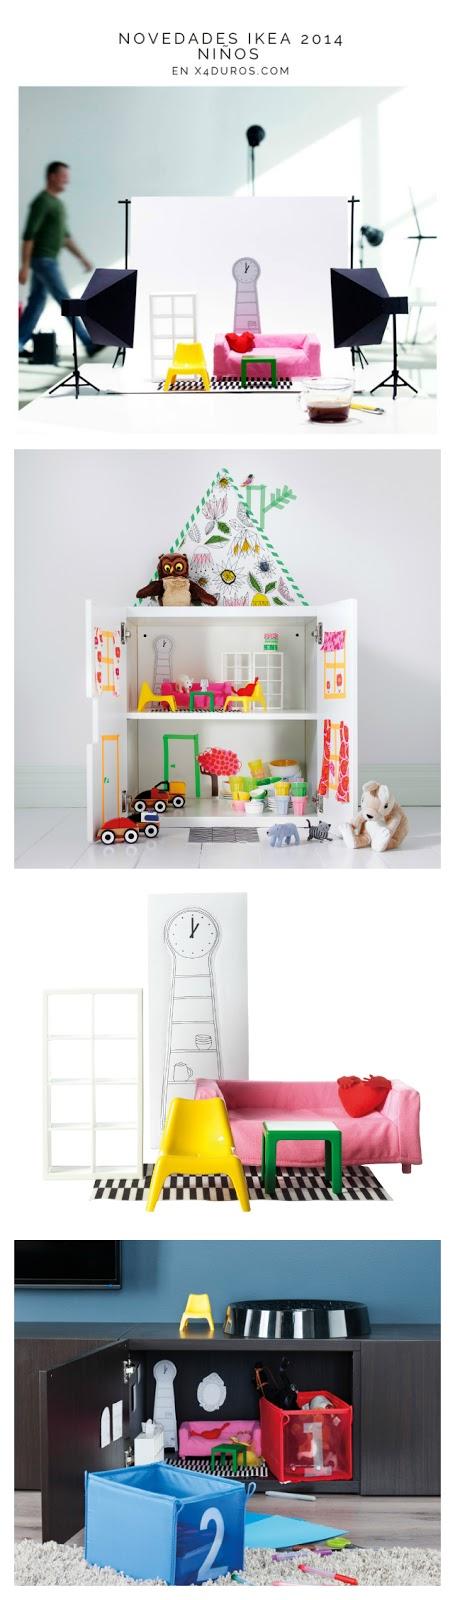 muebles miniatura ikea